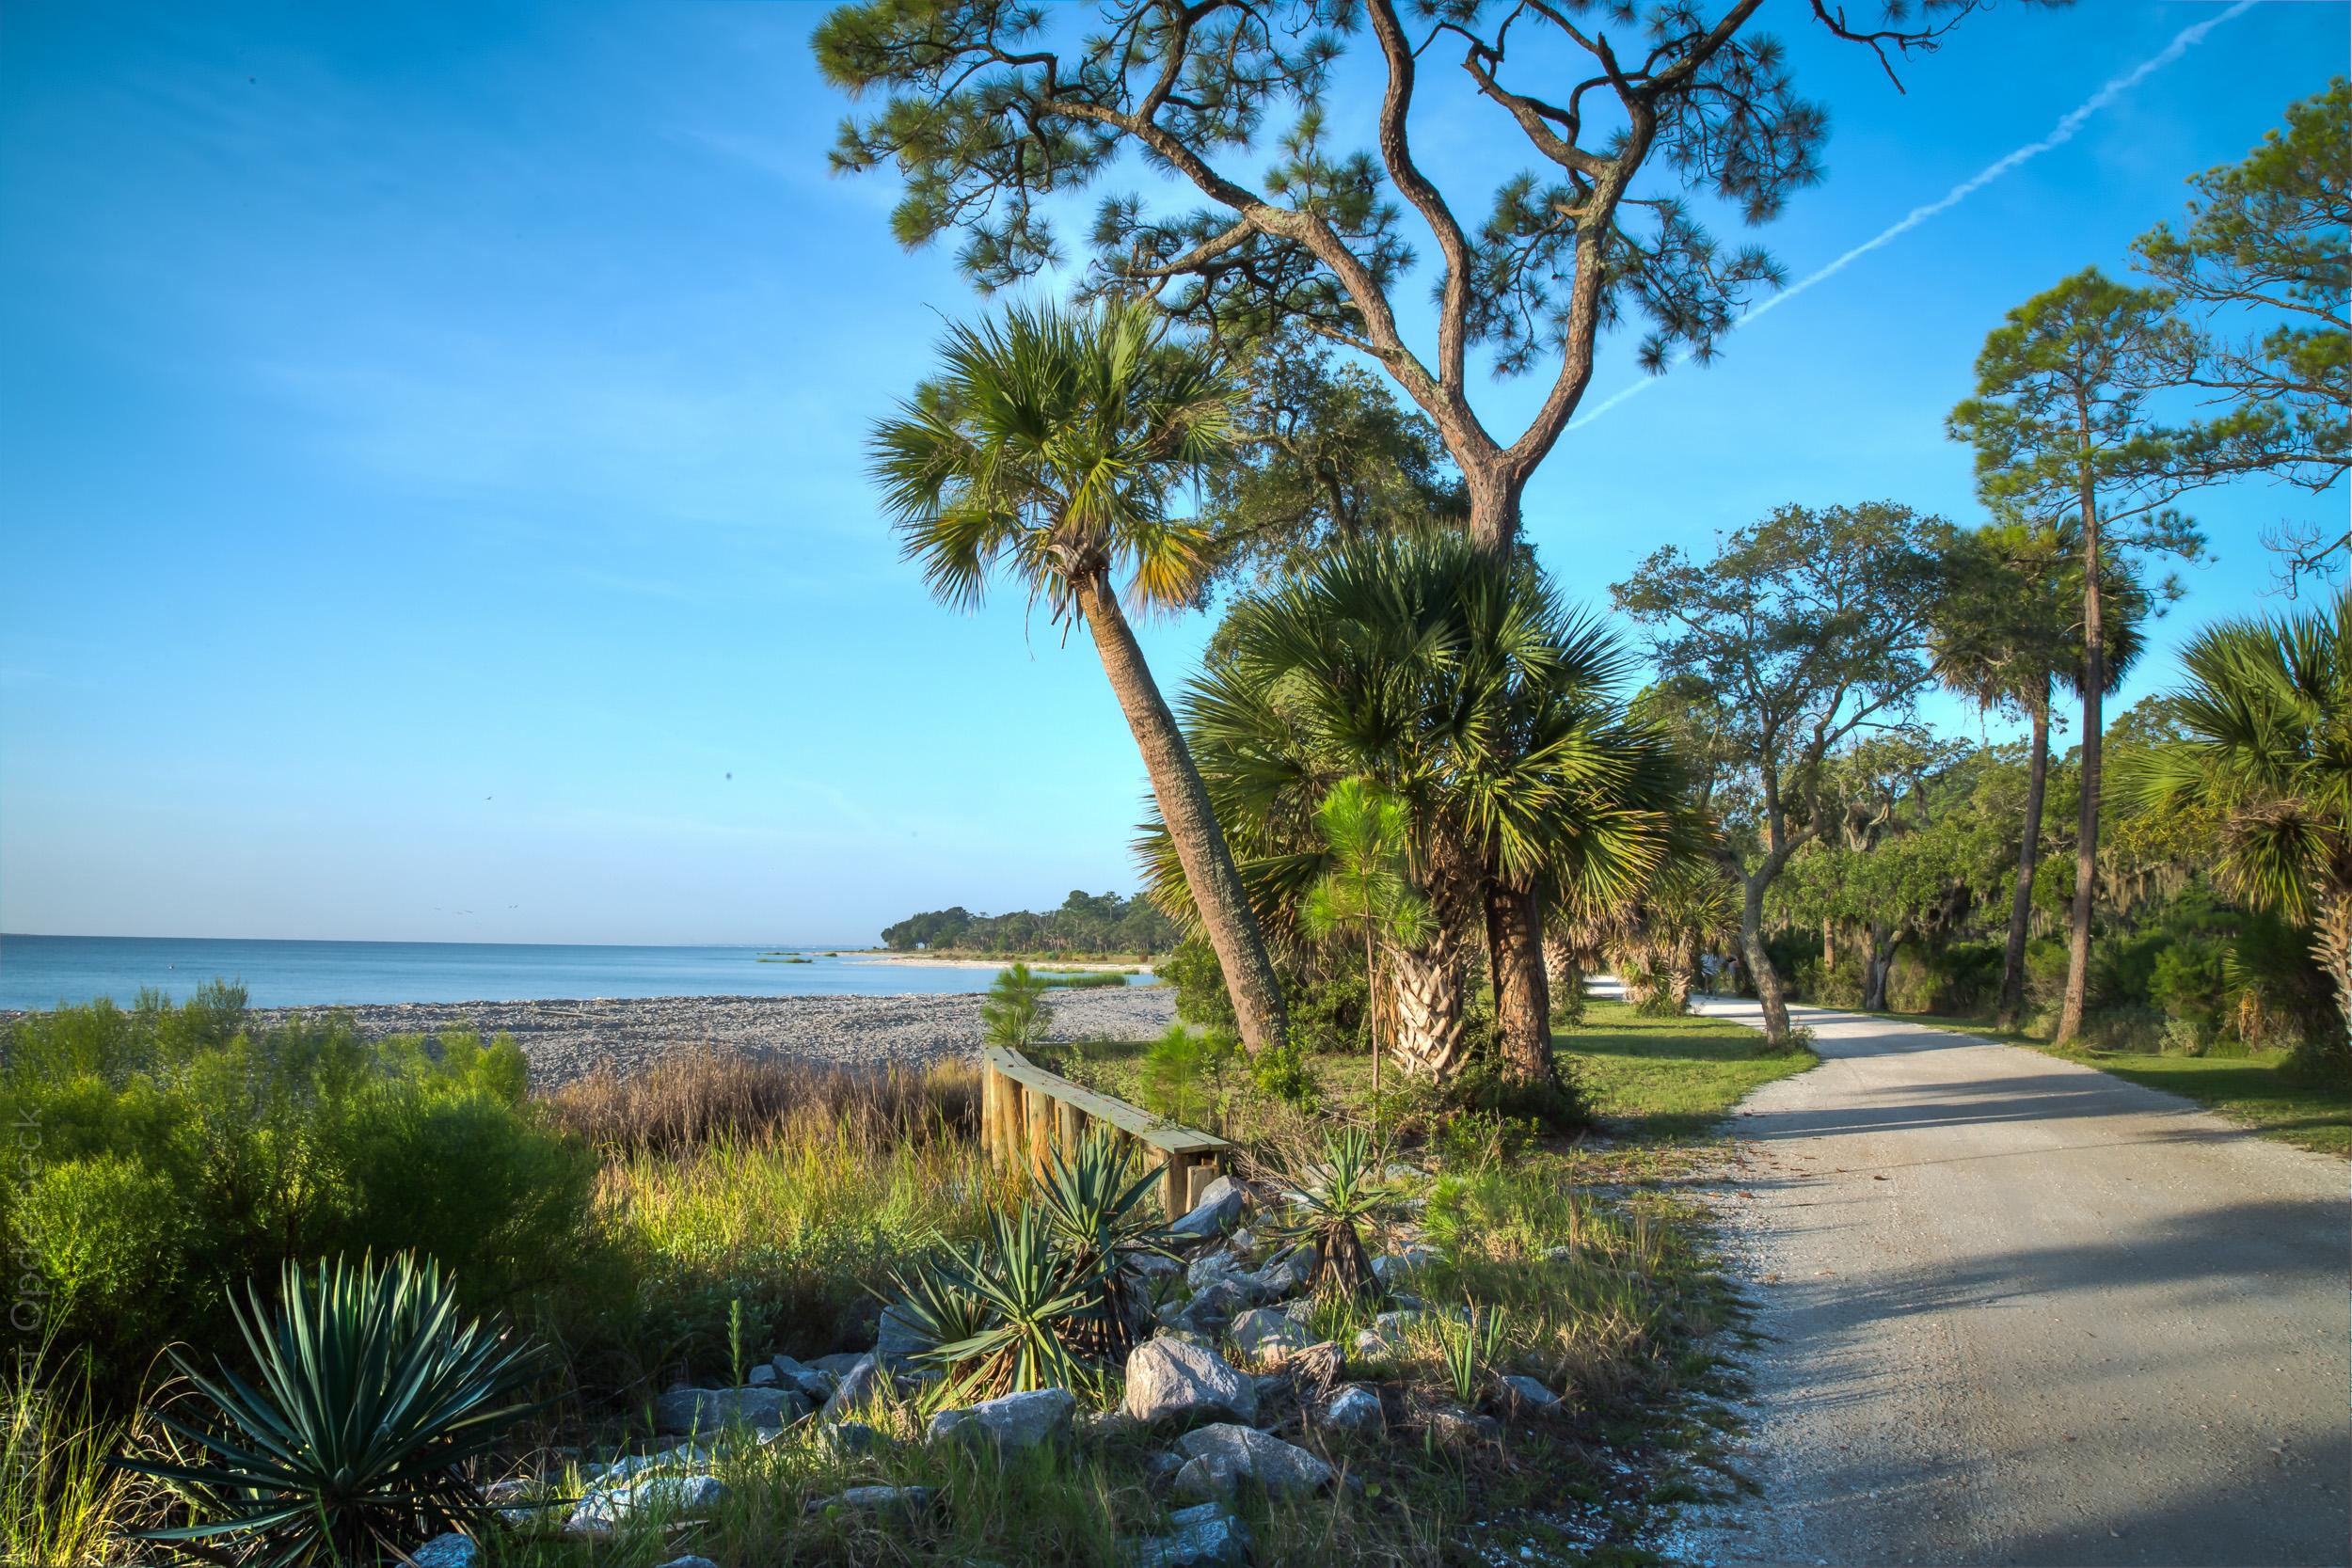 040 beach-road-morning.jpg